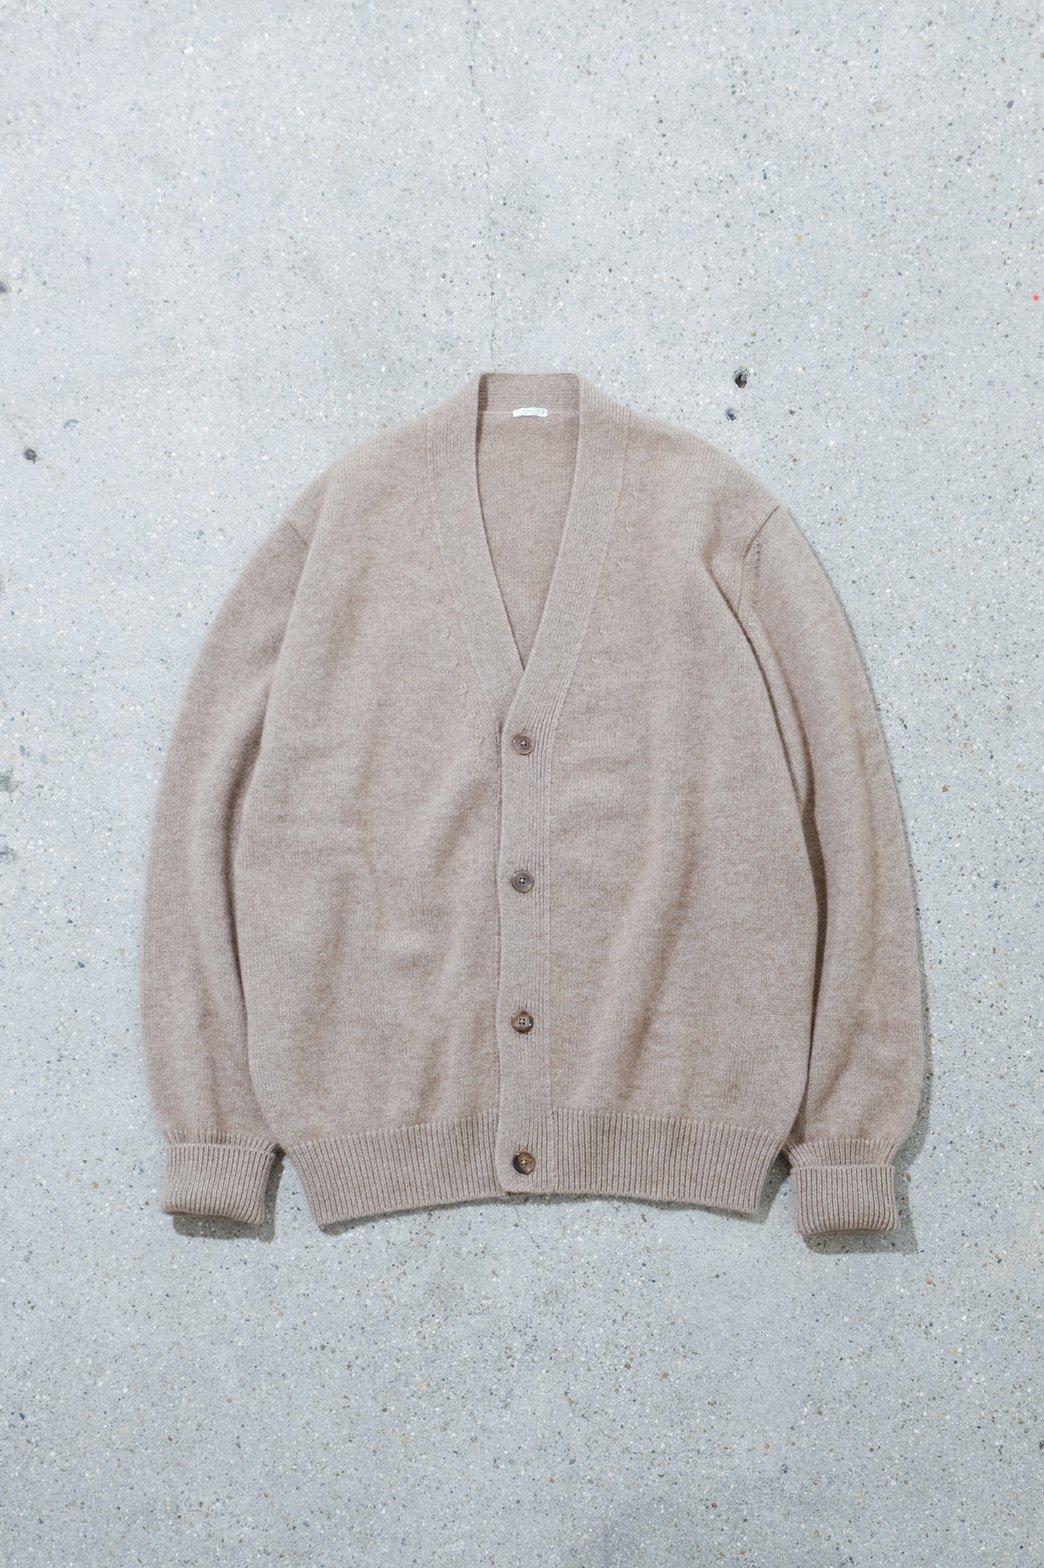 A.PRESSE / Cardigan Sweater